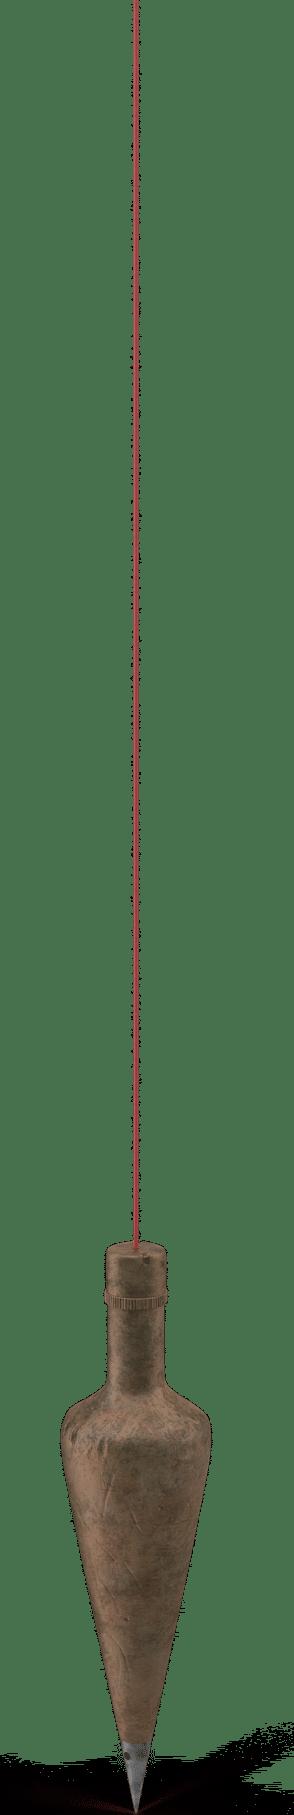 Vintage Plumb With Old String.H03.2k (1)